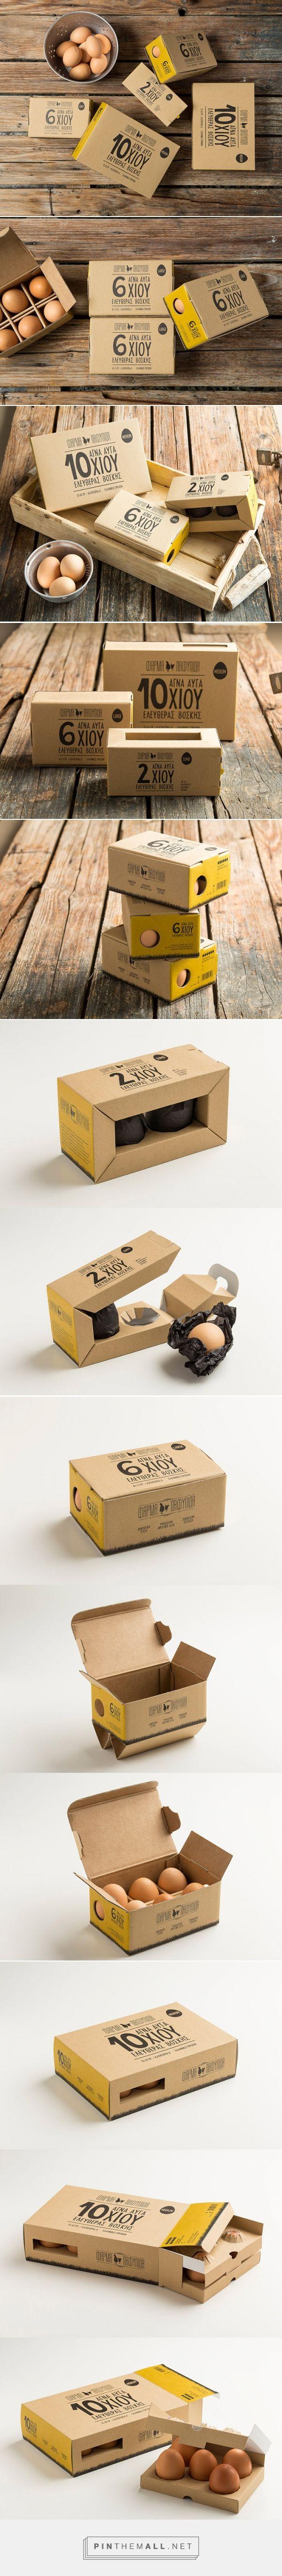 Pafylida Farm Range eggs by Maria Romanidou